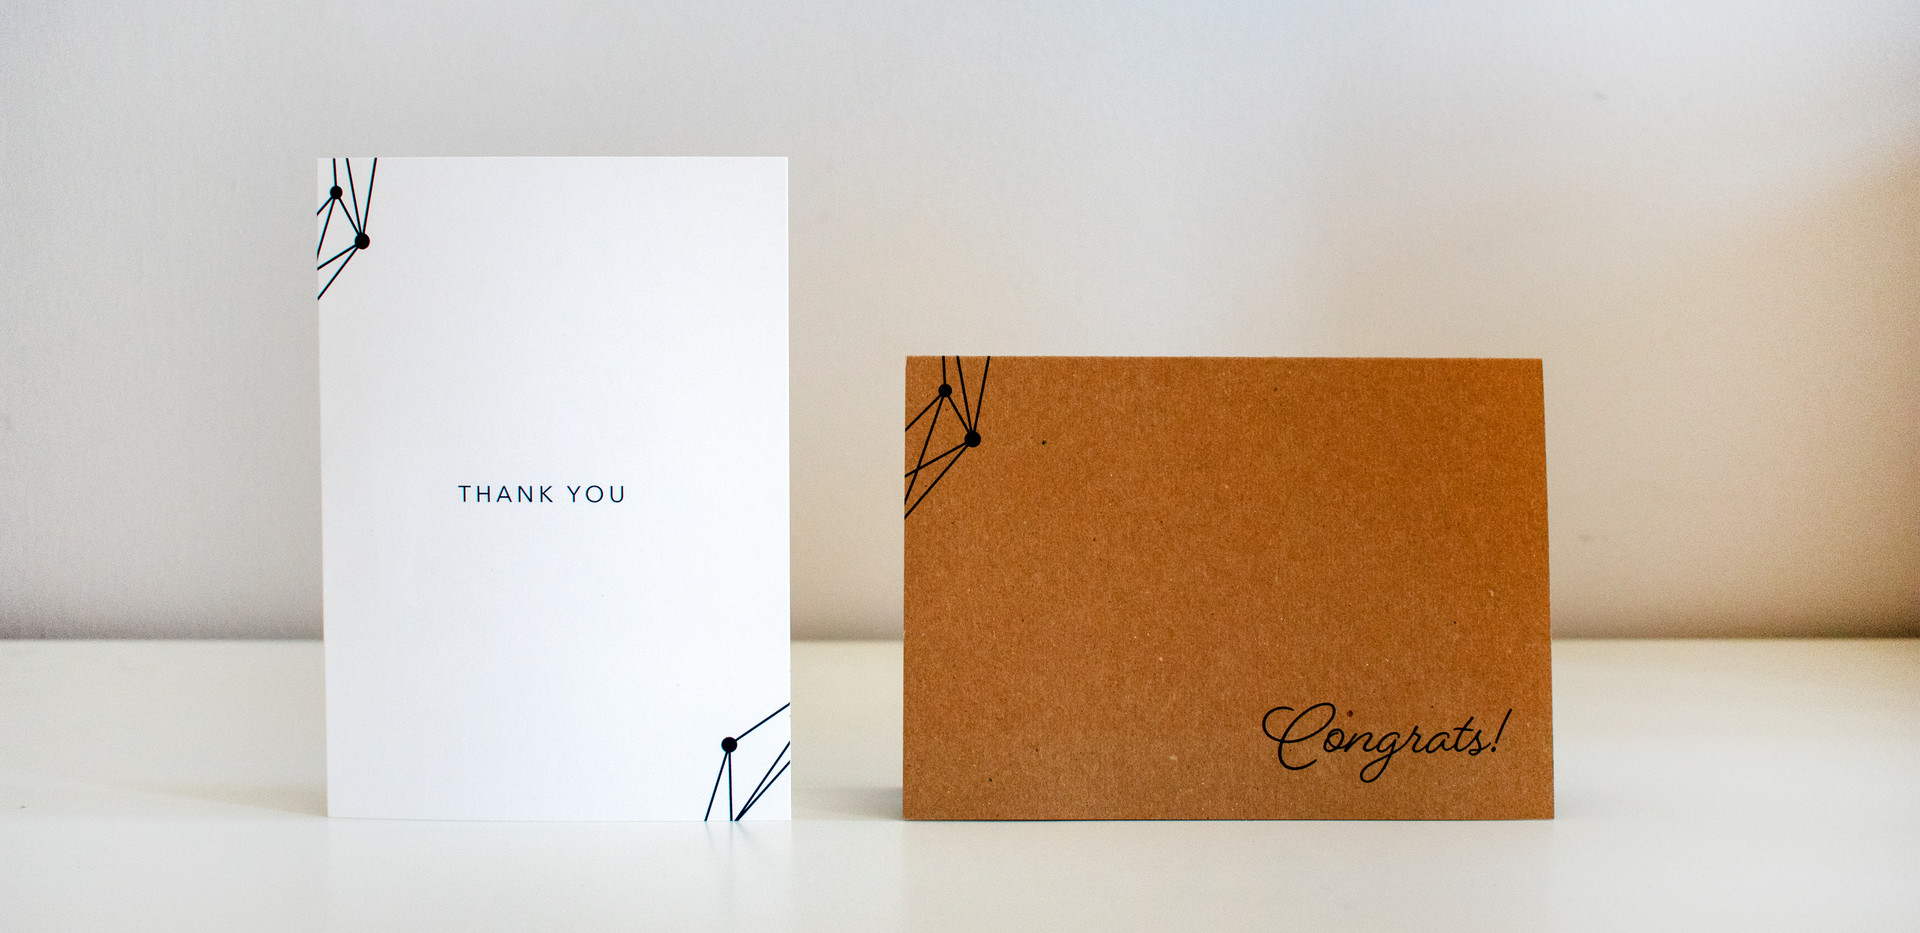 GS Brar Law - Branded Greeting Cards